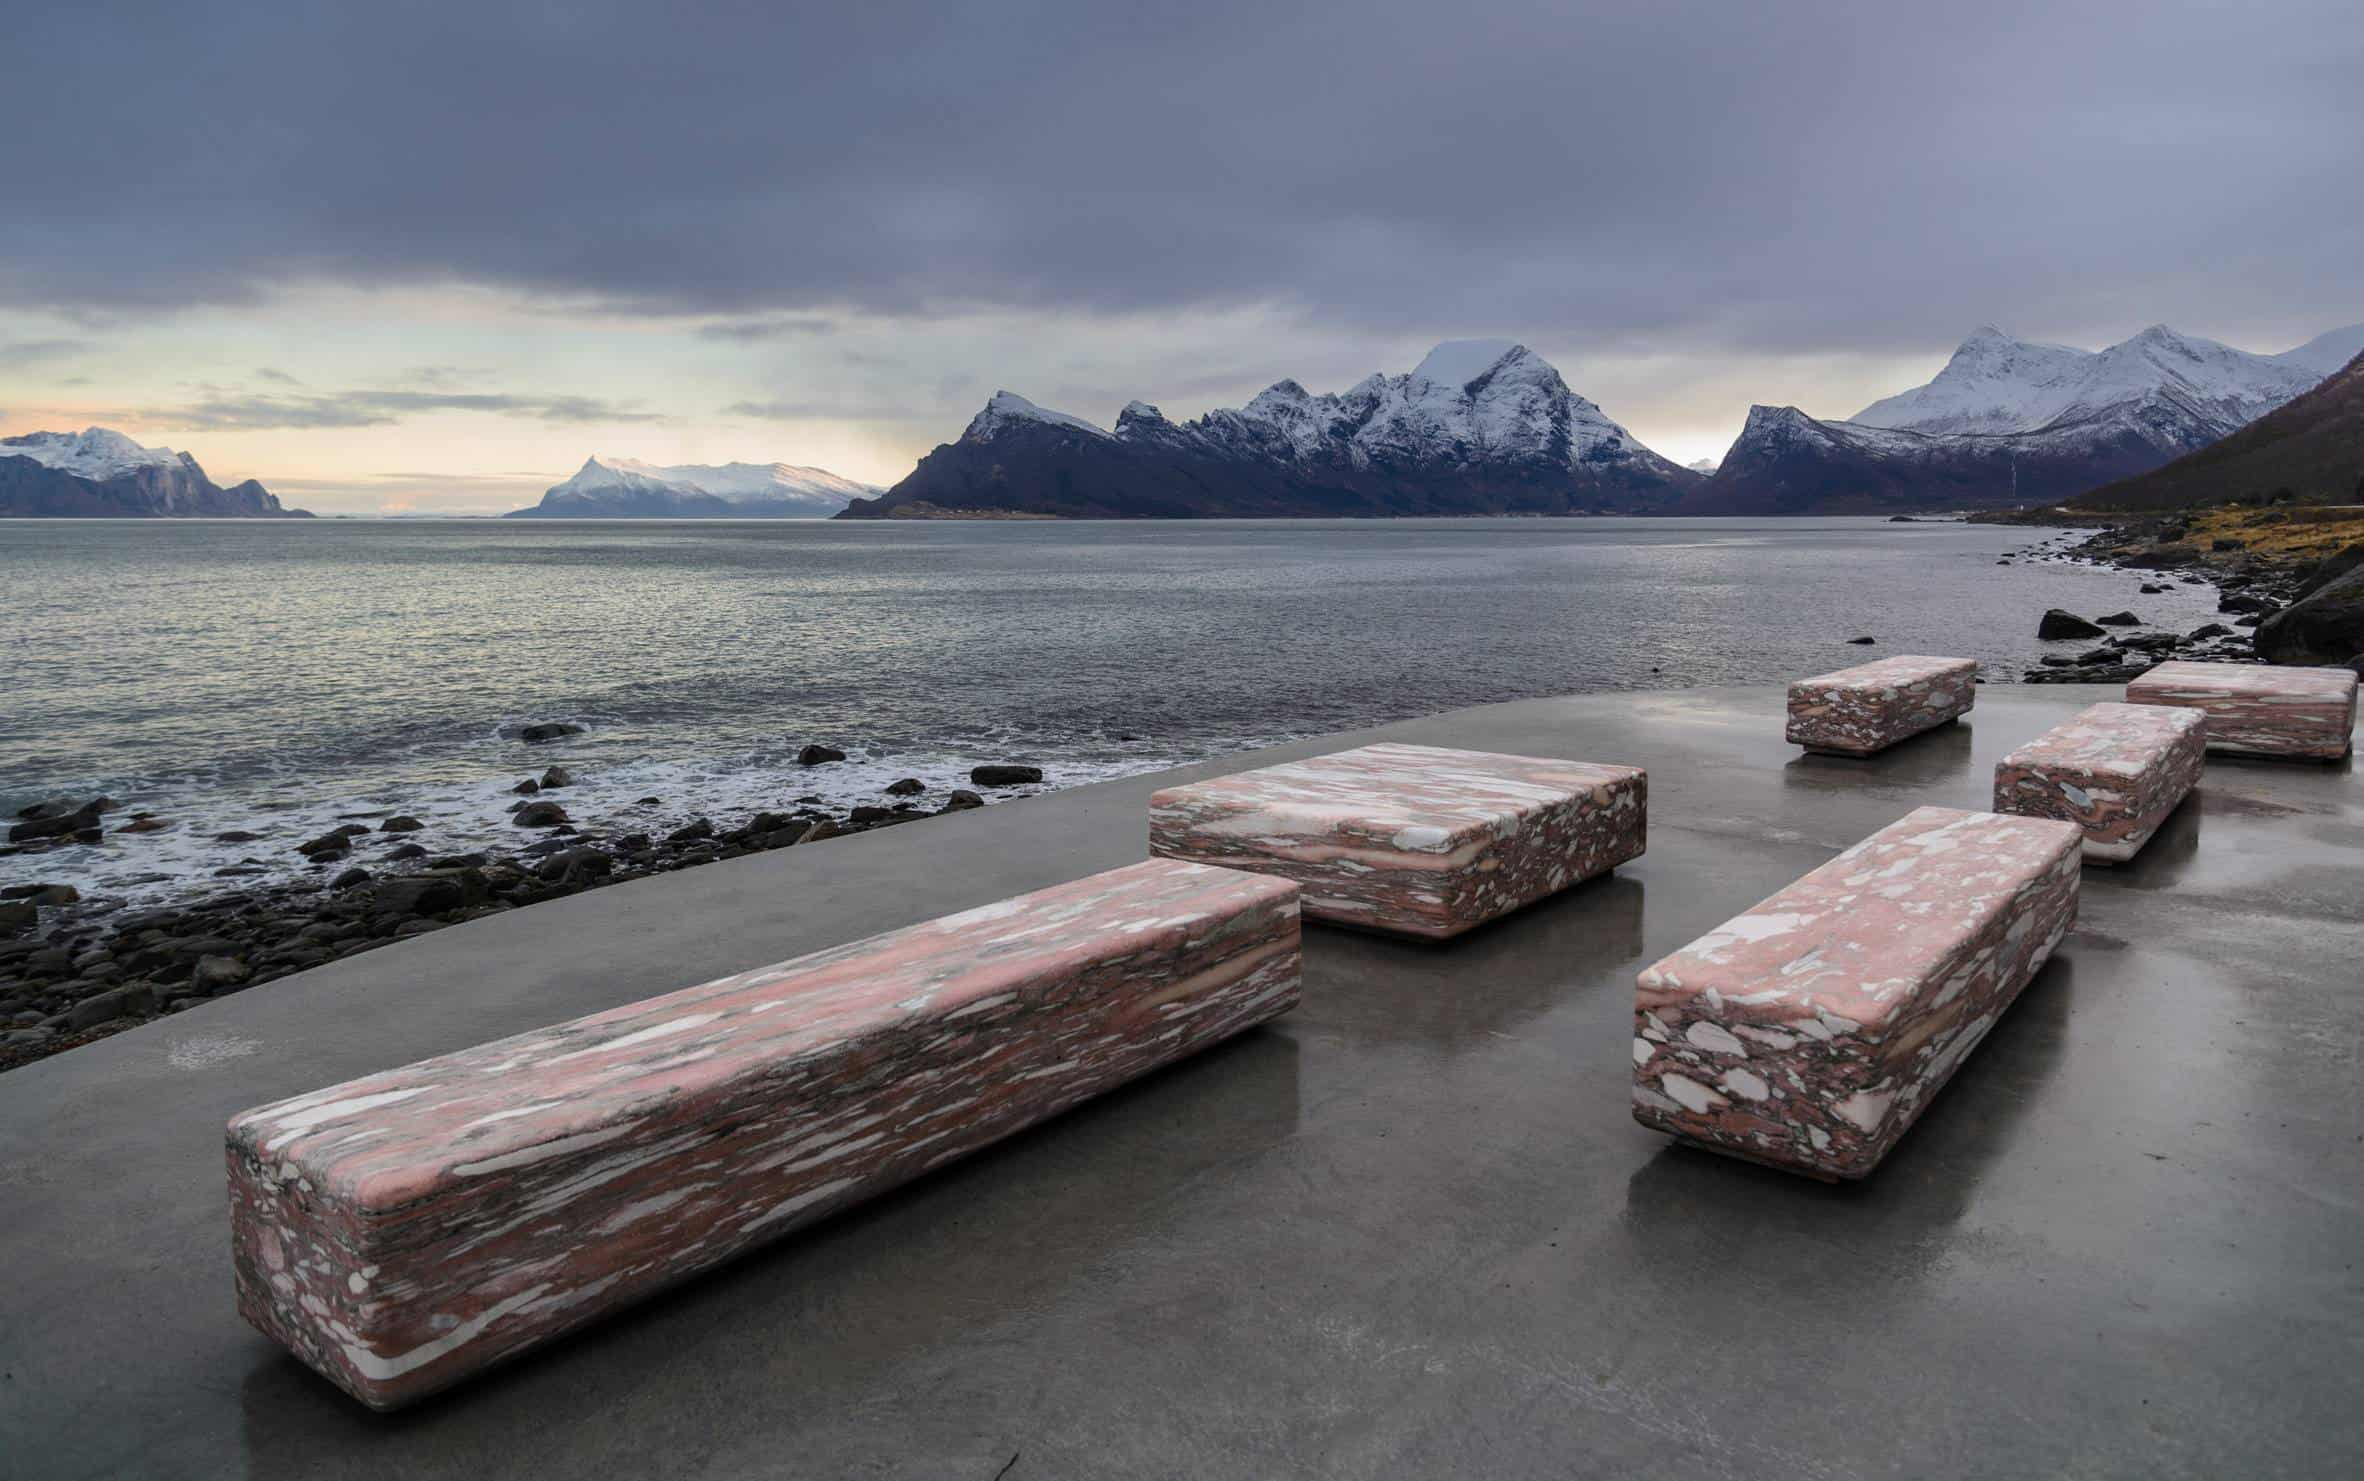 haugen zohar arkitekter hza wave shaped toilet facility norwegian scenic route 14